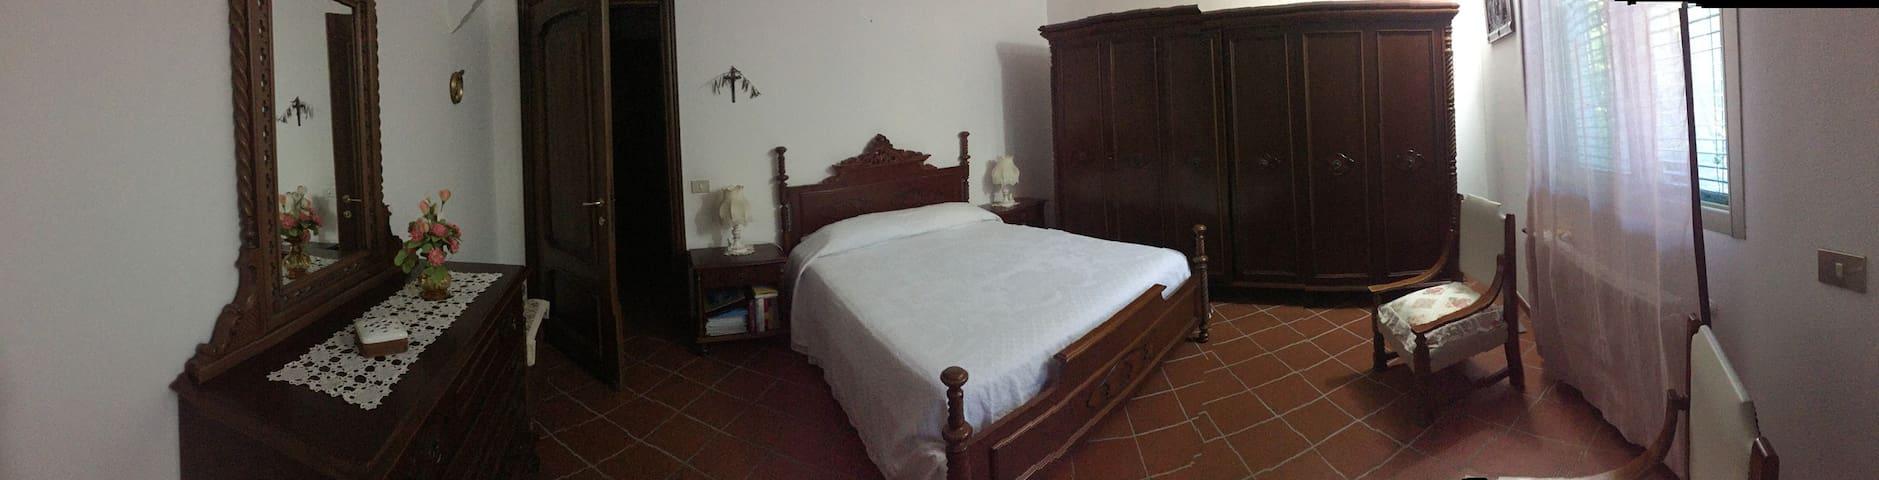 Chambre des maîtres Villa dans la champagne - Gazzelli - Villa